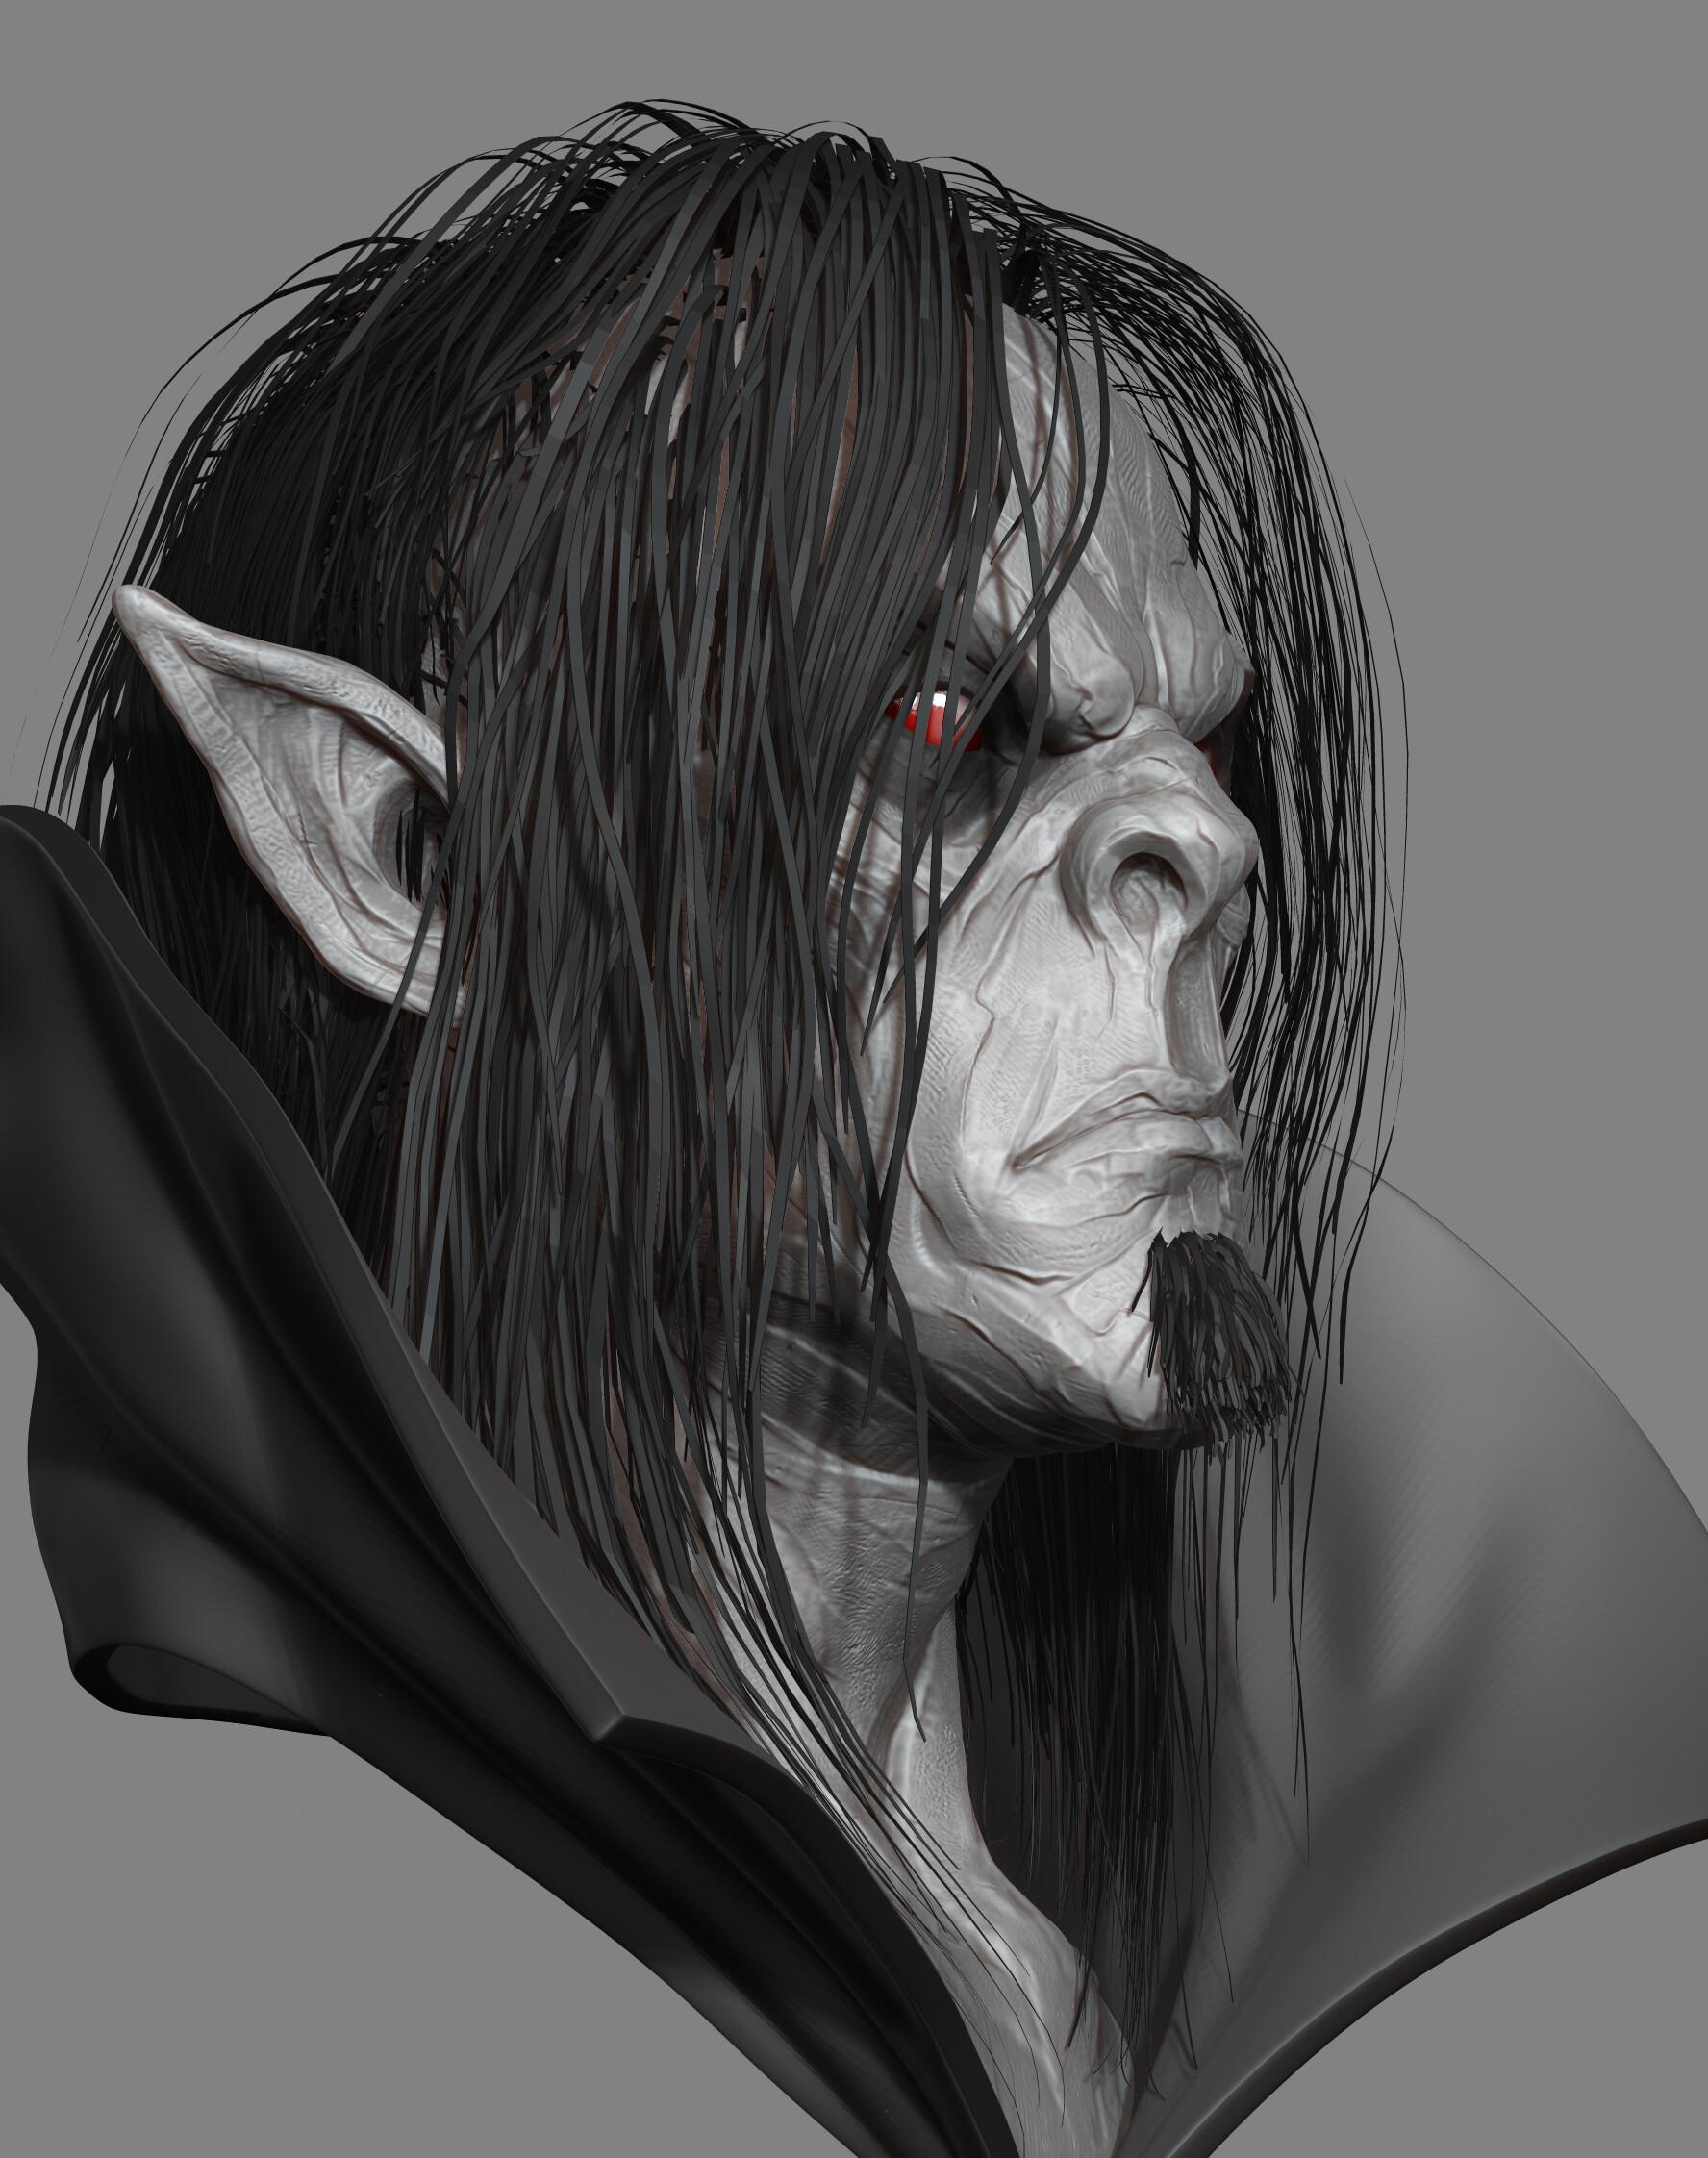 Poligone cg morbius 6